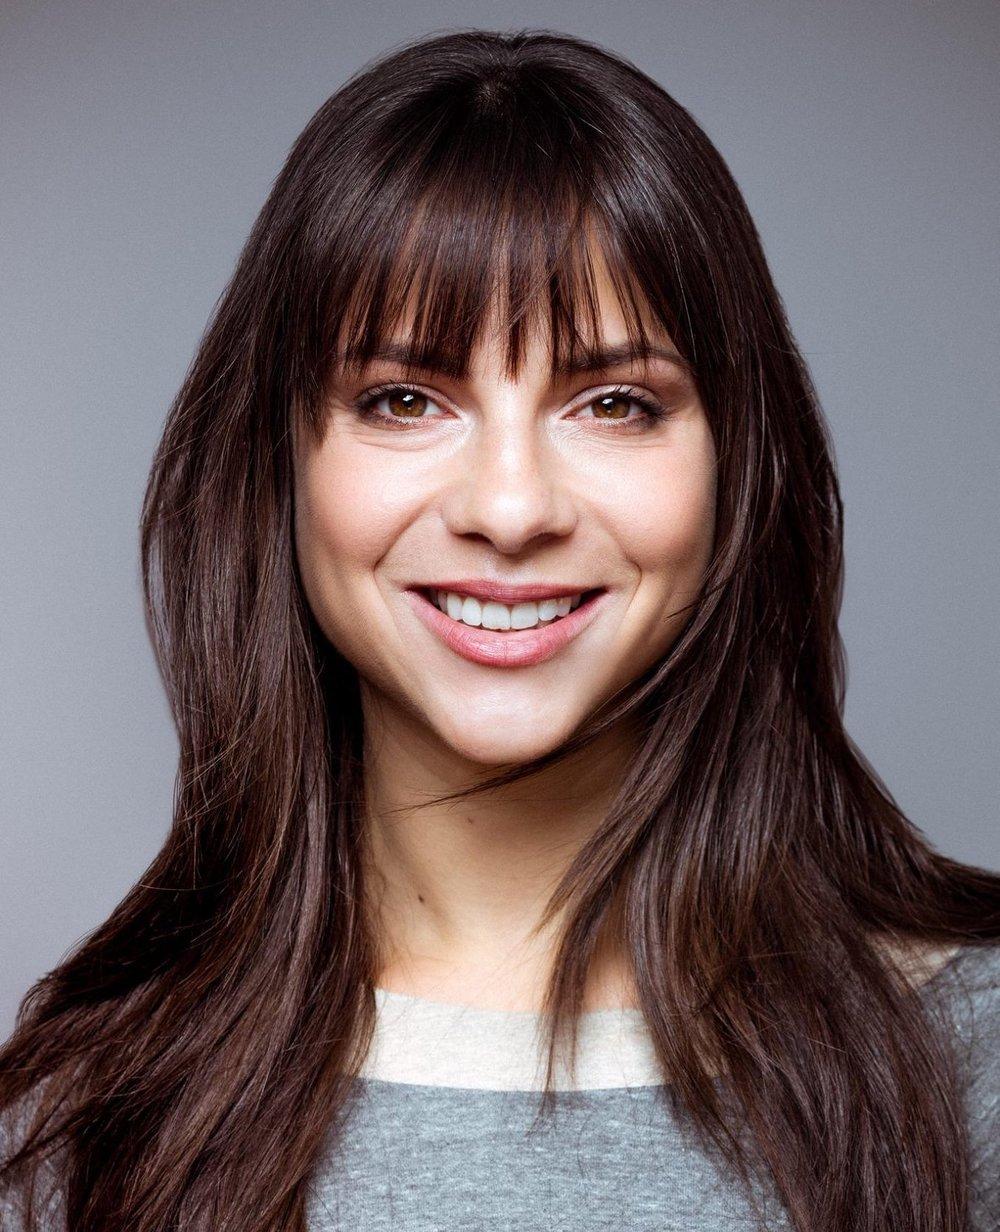 Brooke Siem - Speaker, Writer, Chef - Brooke Siem is a